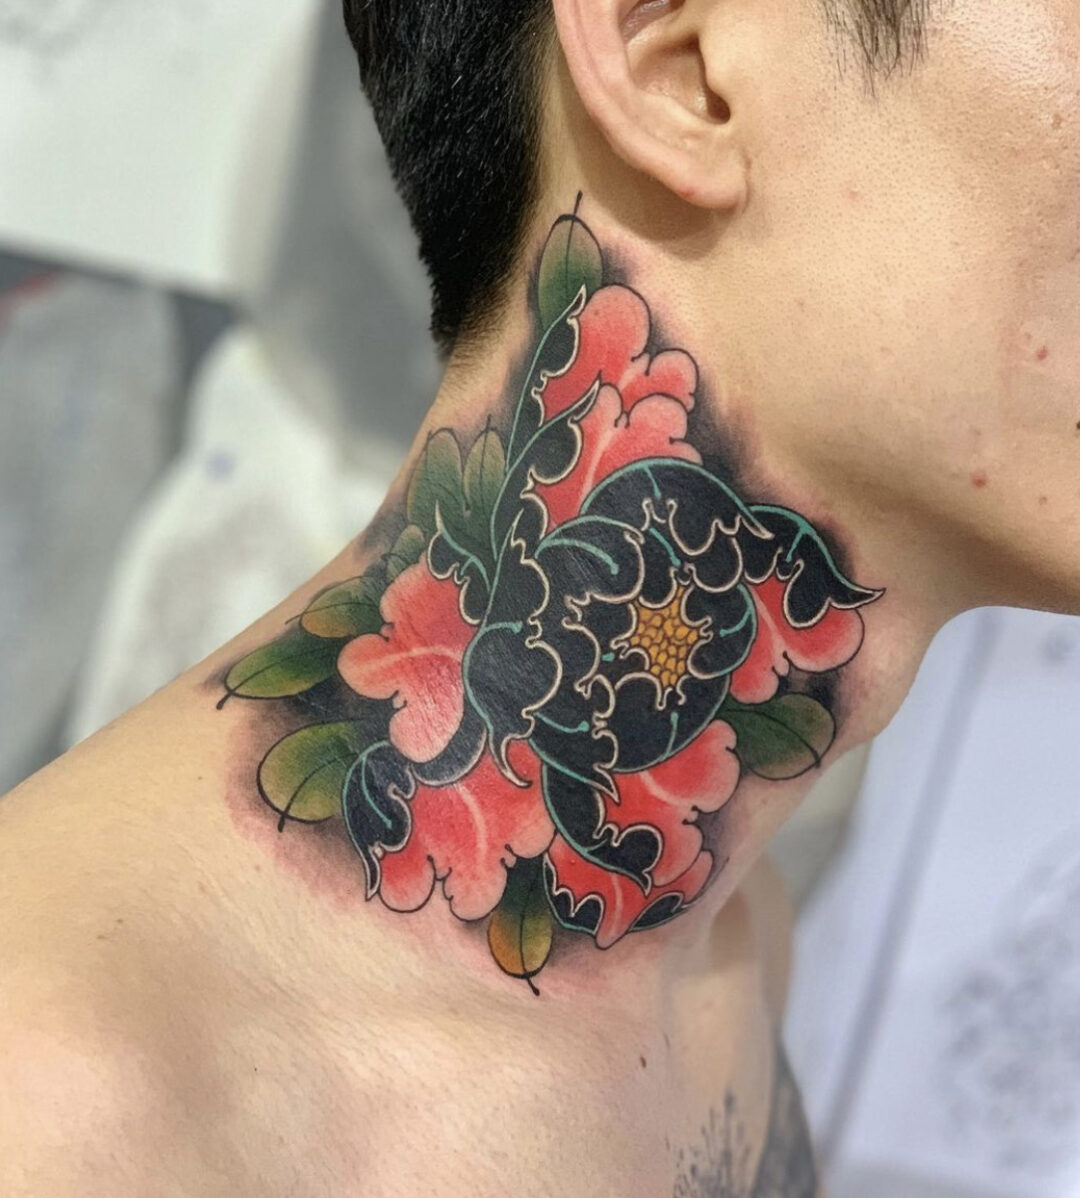 Hocheon, New Flame Ink, Seoul, South Korea